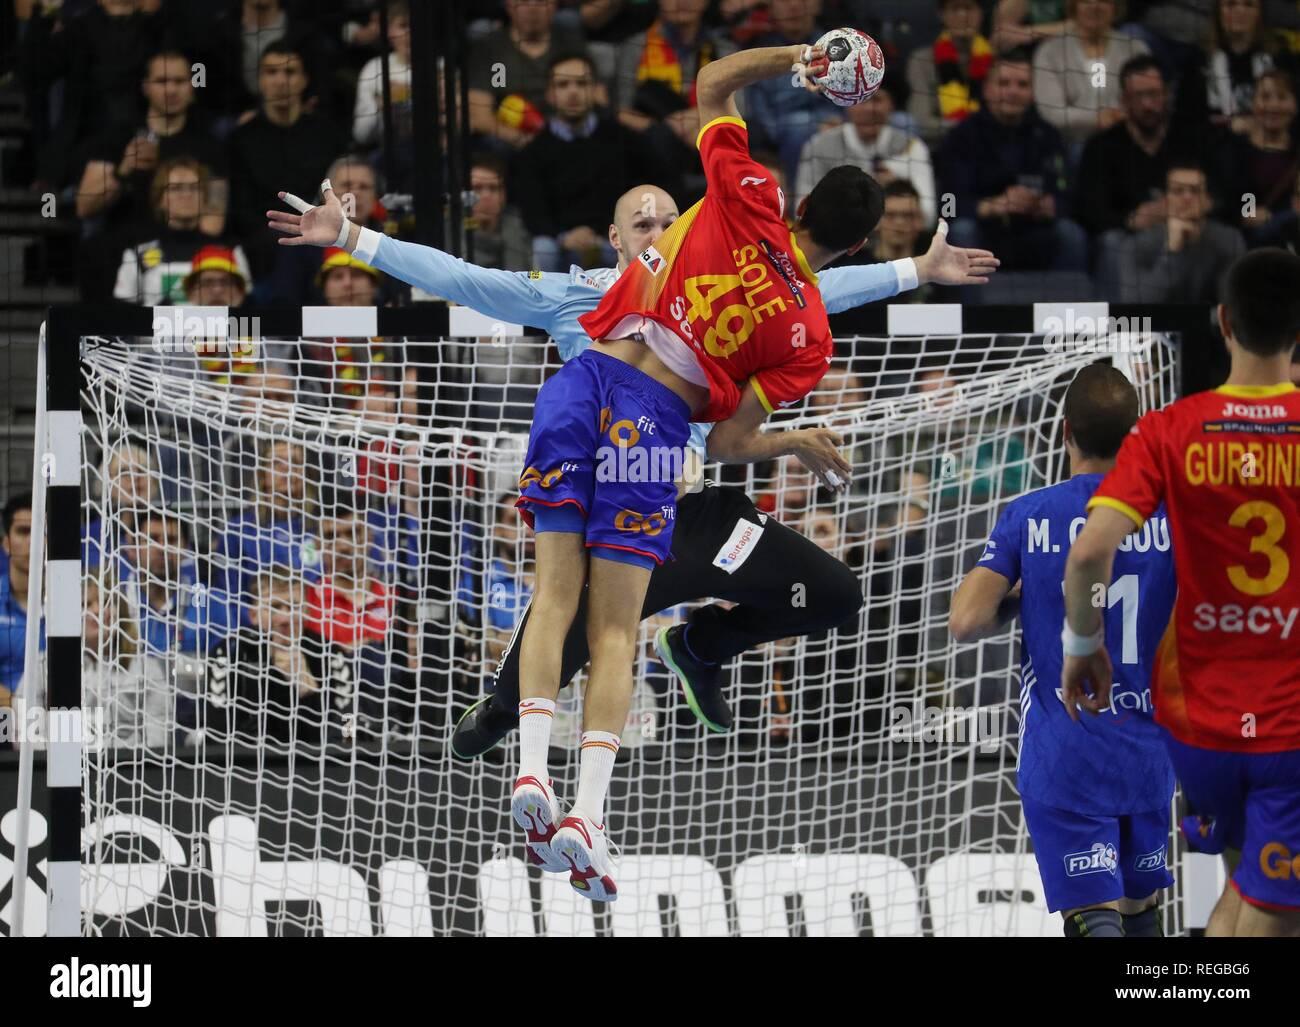 firo: 19.01.2019, Handball: World Cup World Cup Main Round France - Spain. Vincent Gerard Parade versus Sole   usage worldwide - Stock Image